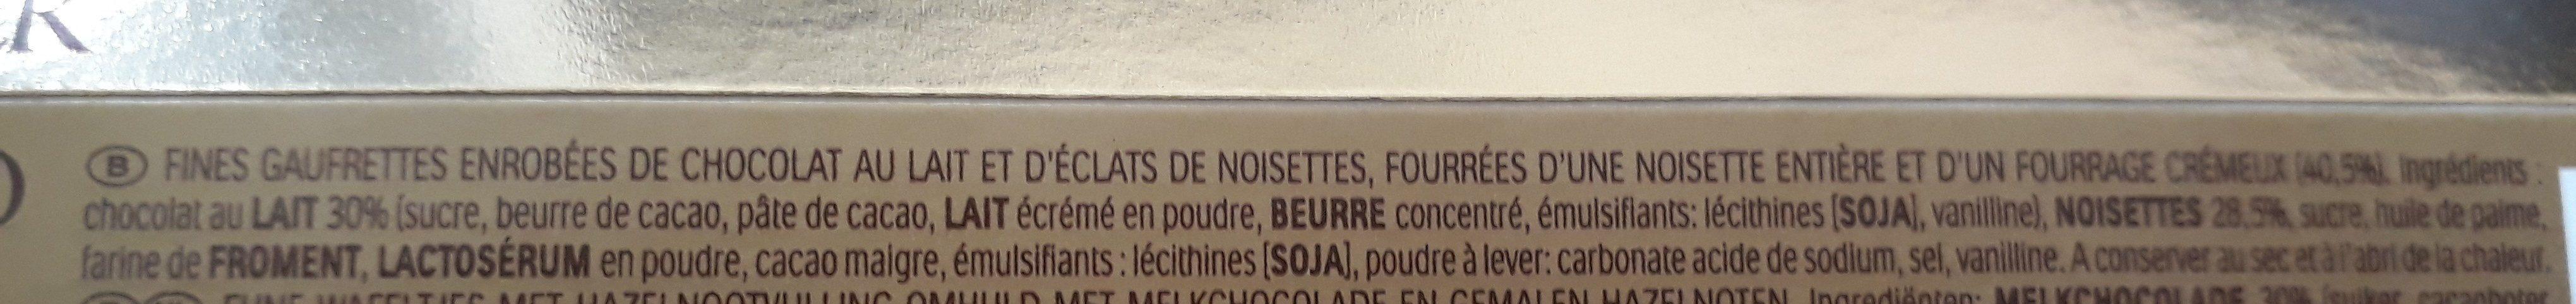 Ferrero Rocher - Ingredienti - fr